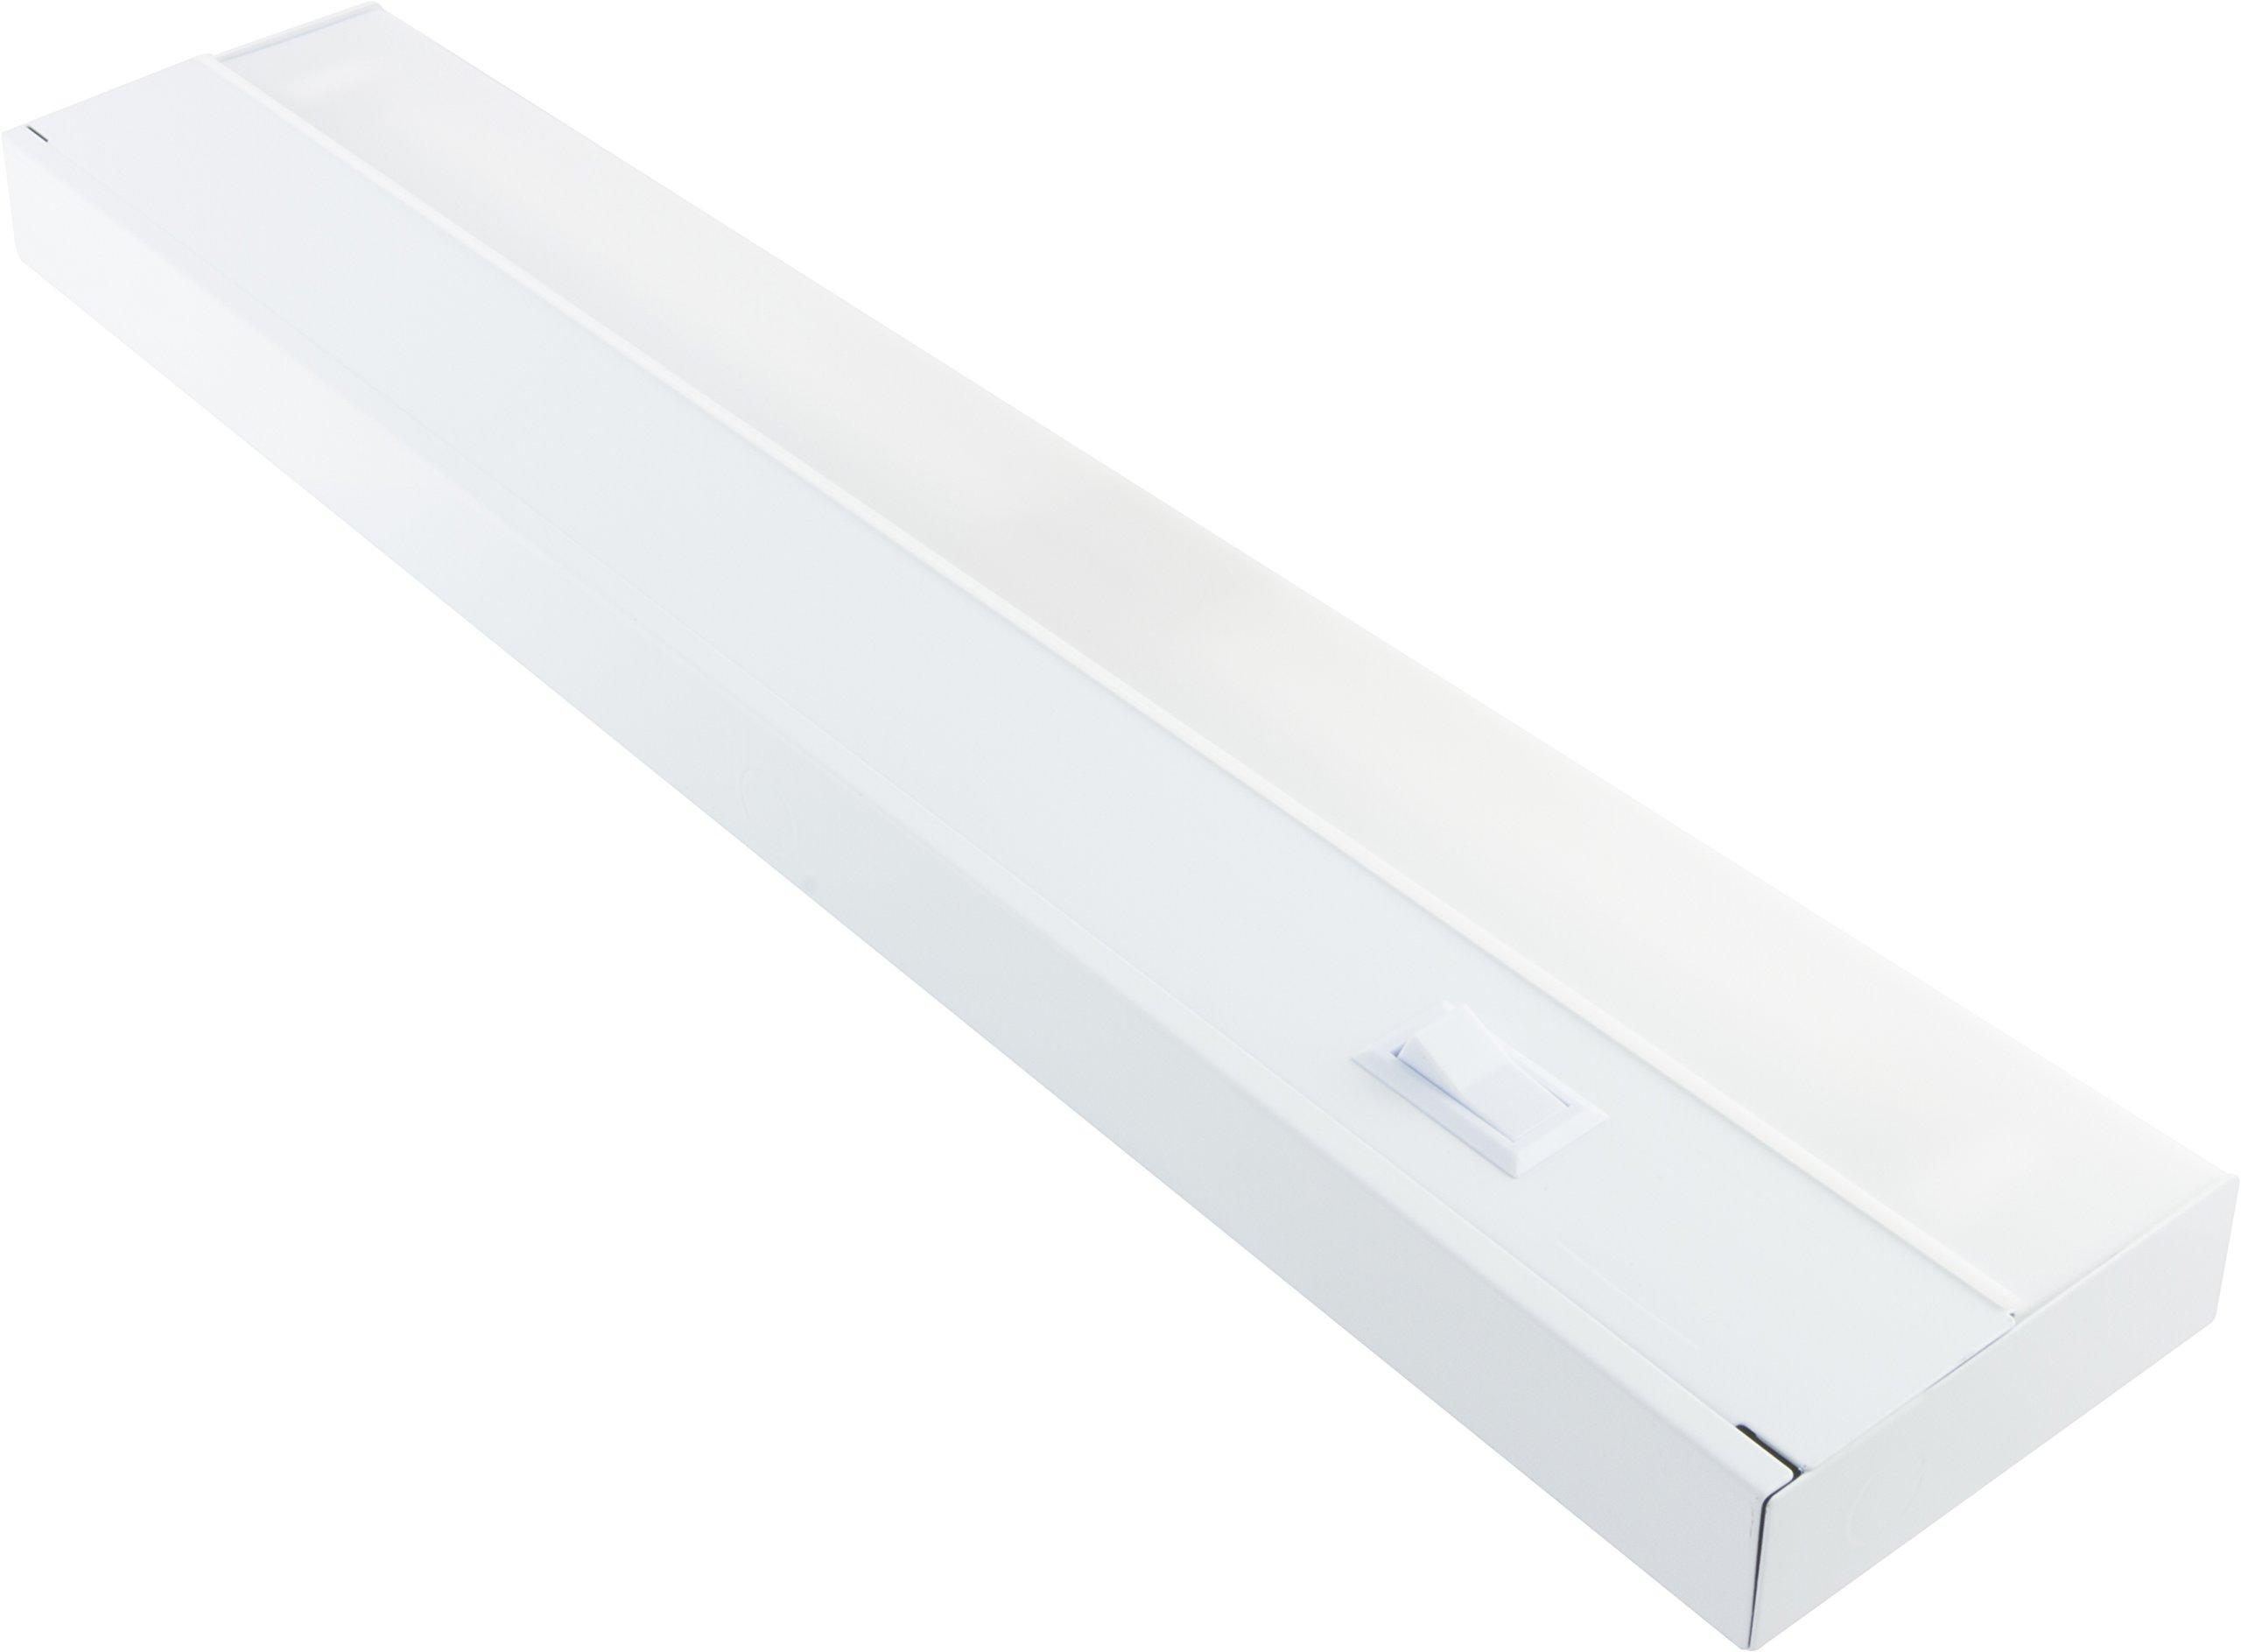 GE Premium 48 Inch Fluorescent Under Cabinet Light Fixture, Direct Wire, Warm White, Steel Housing, On/Off Switch, No Hum, Flicker Free, Ideal for Kitchen, Office, Garage, Workbench and more, 10143